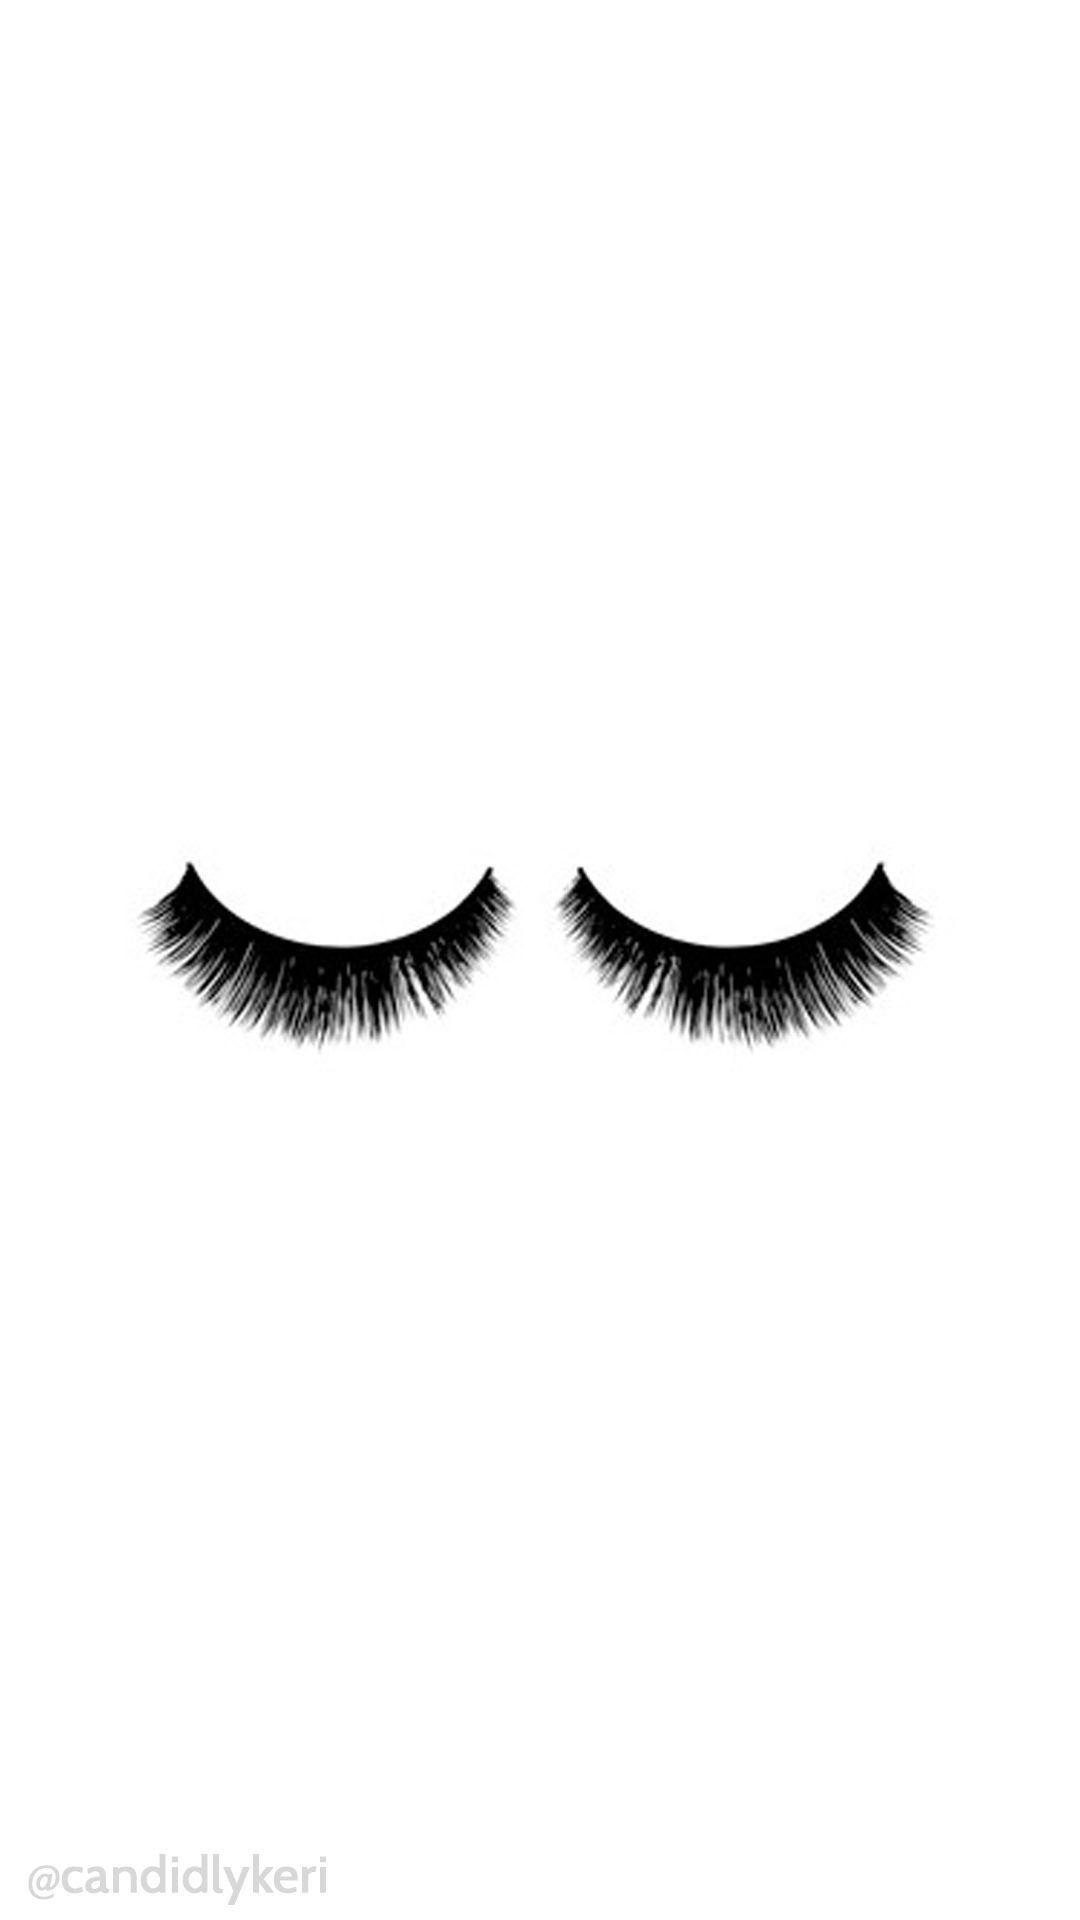 Eyelashes Fake Lashes Sleepy Background Wallpaper You Can Download